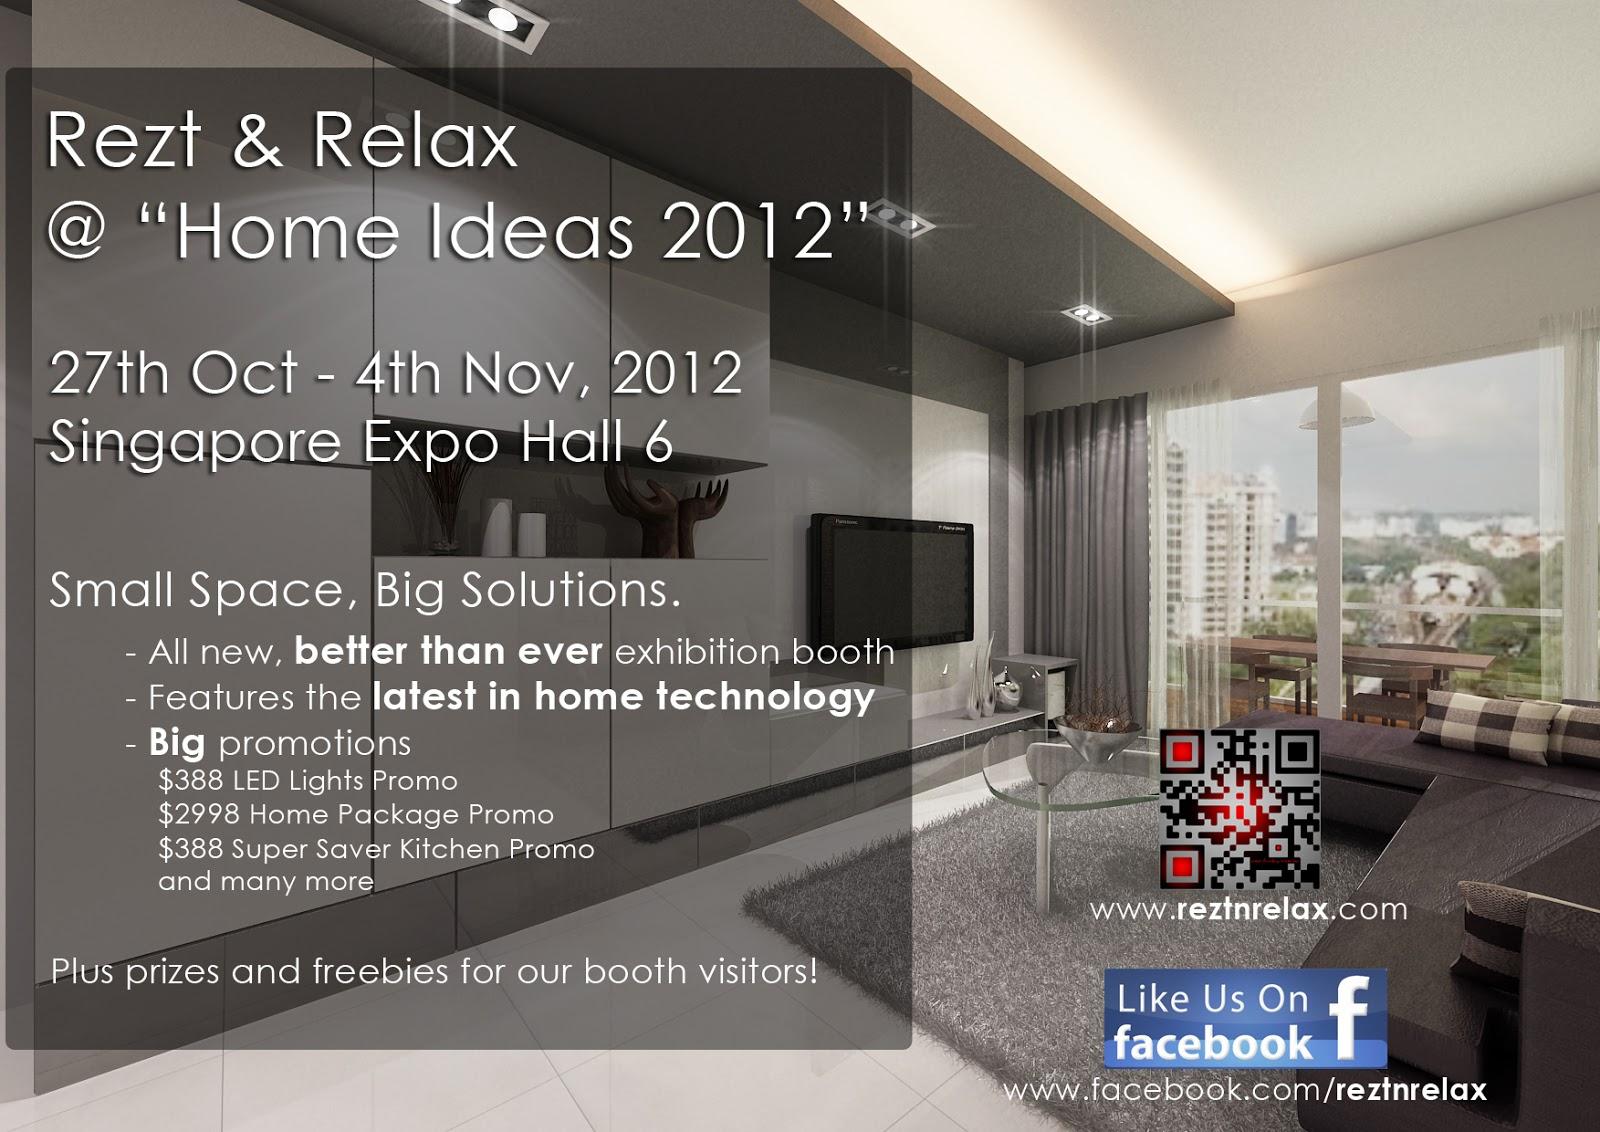 Home Ideas 2012